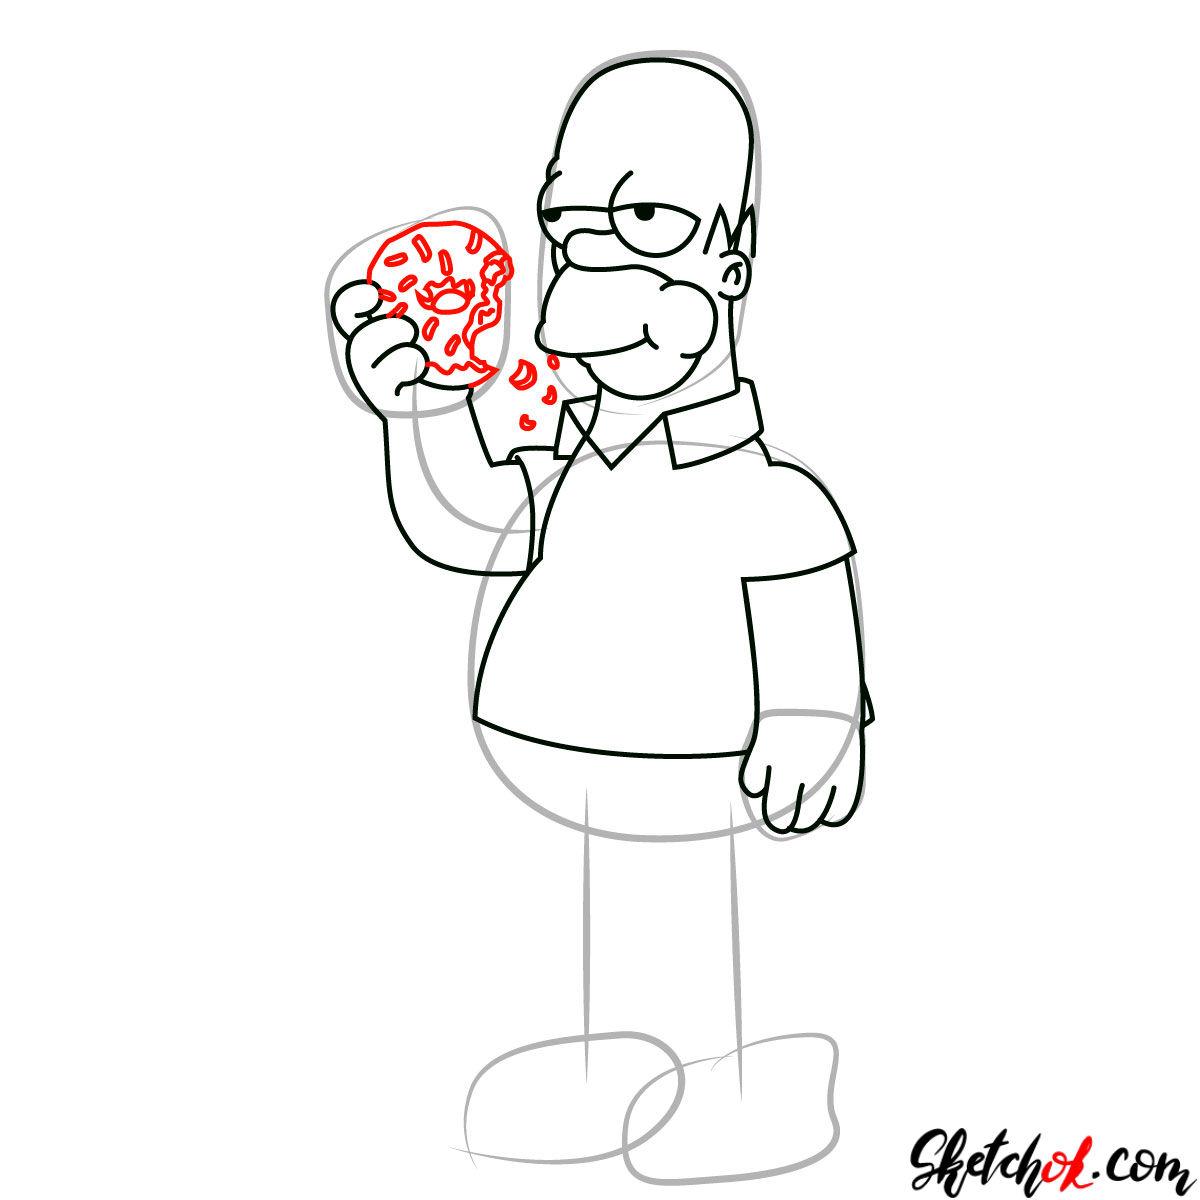 Donut Cartoon Drawing